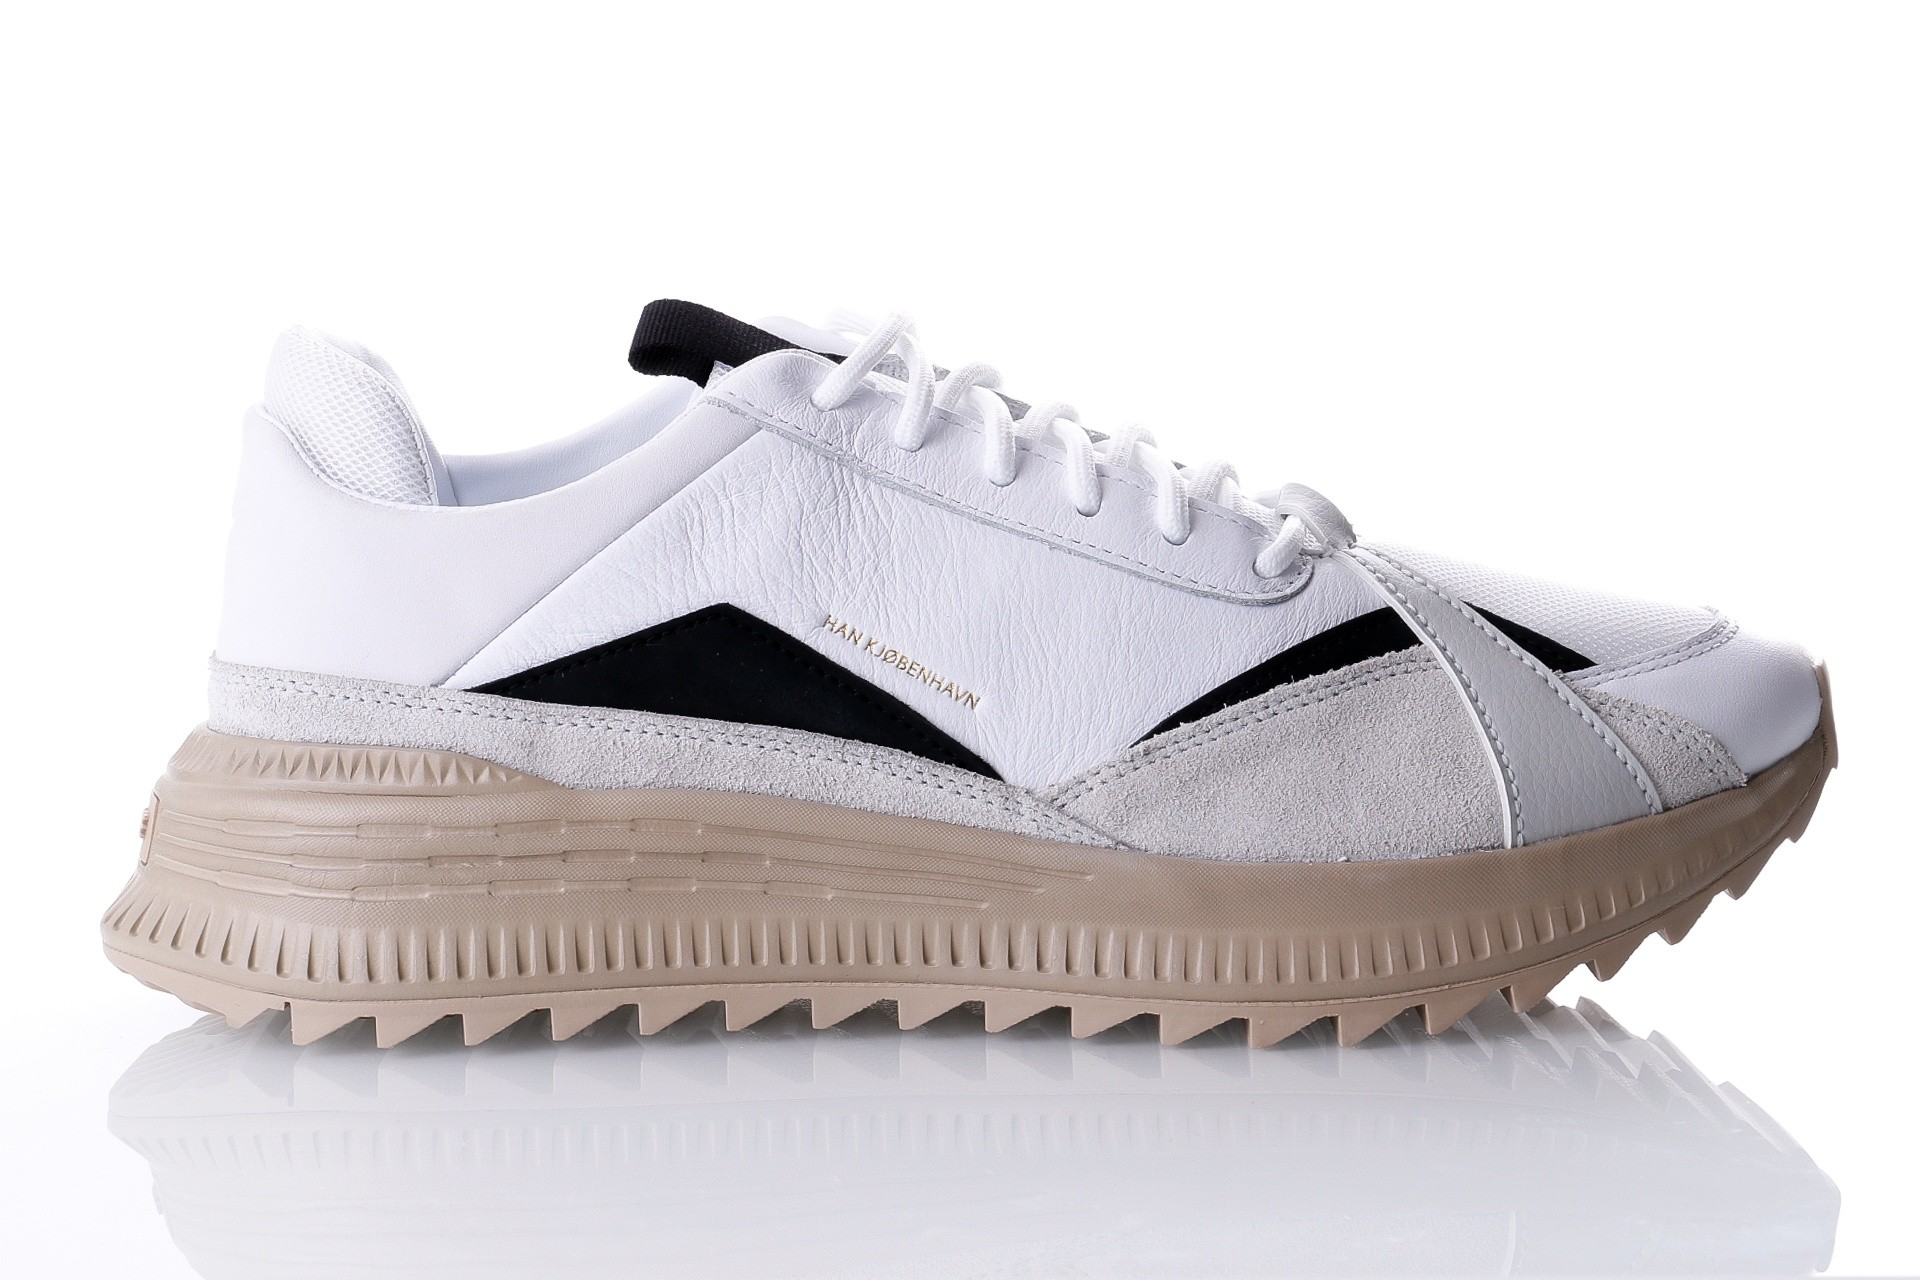 Afbeelding van Puma Avid HAN 367187 Sneakers steel grey-safari